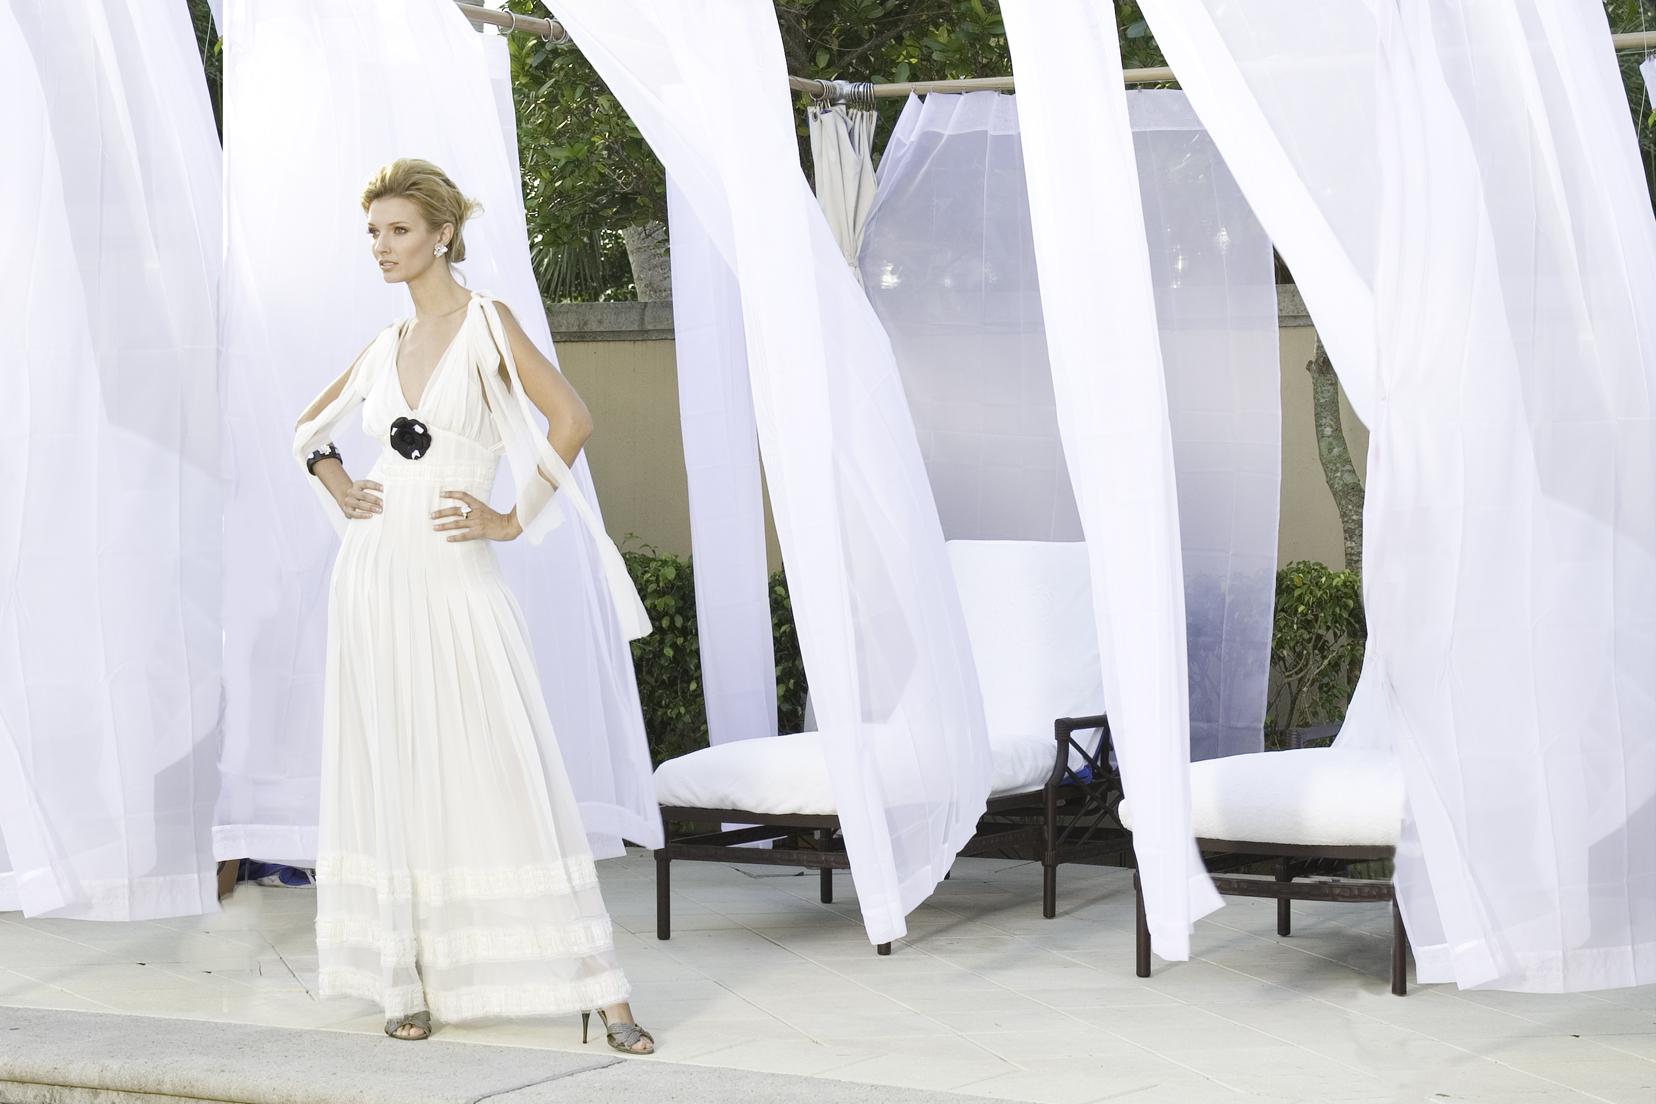 ritz_carlton_fashion_resort_female_MG_0447.jpg